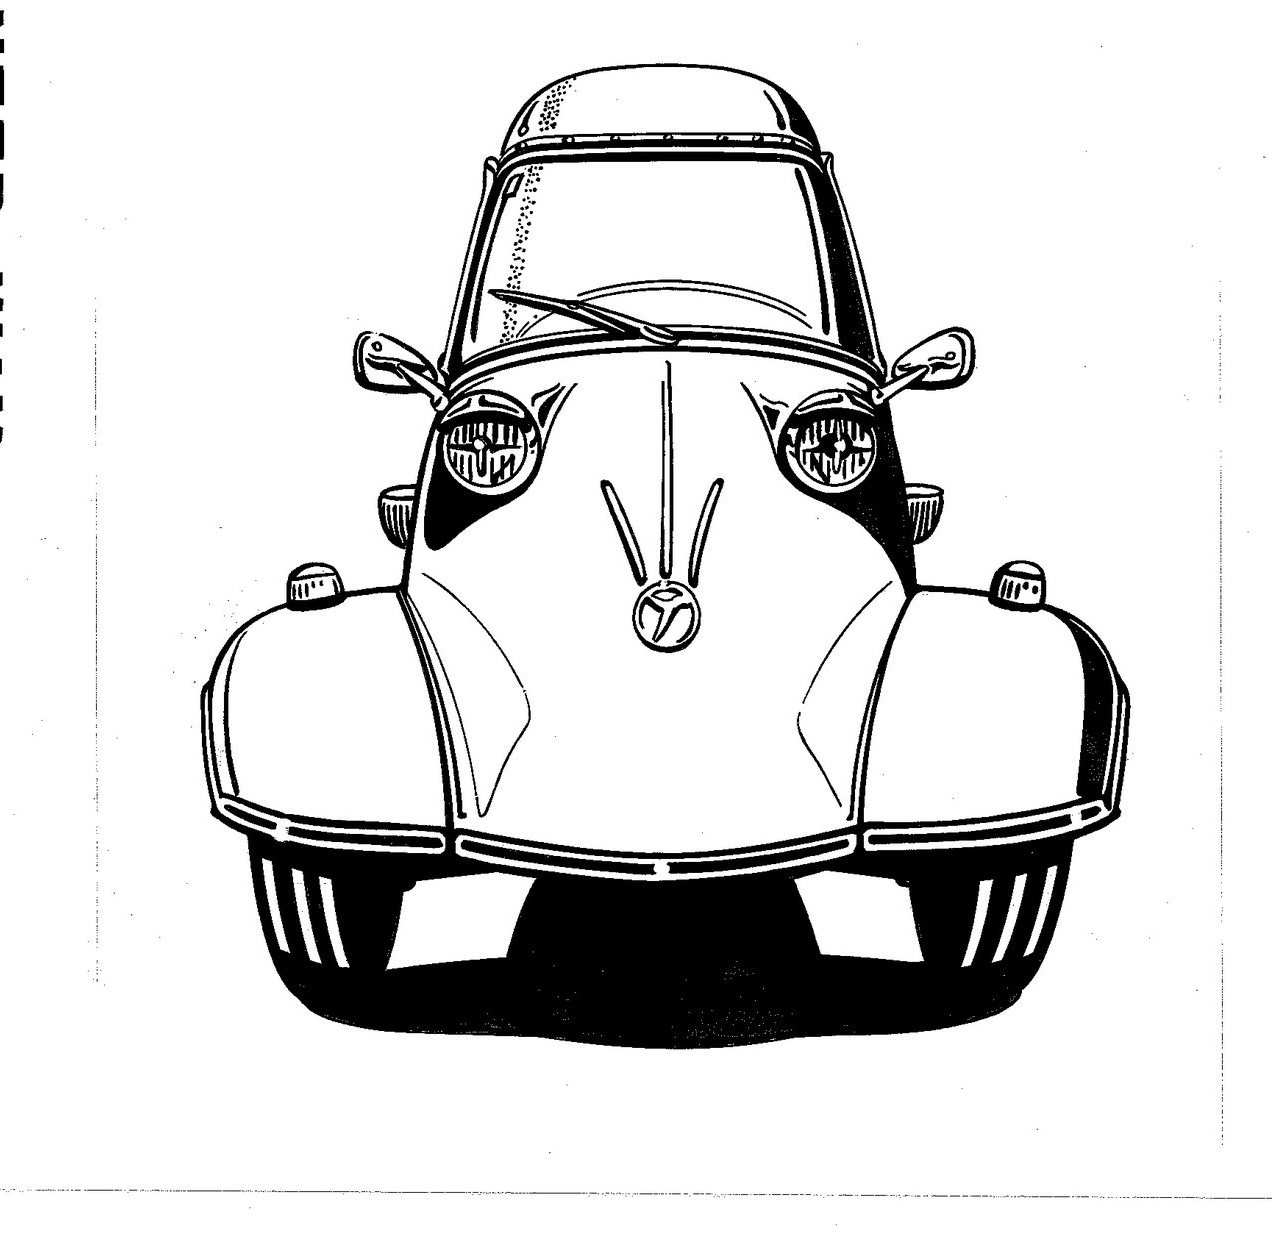 Sketch-25.jpeg